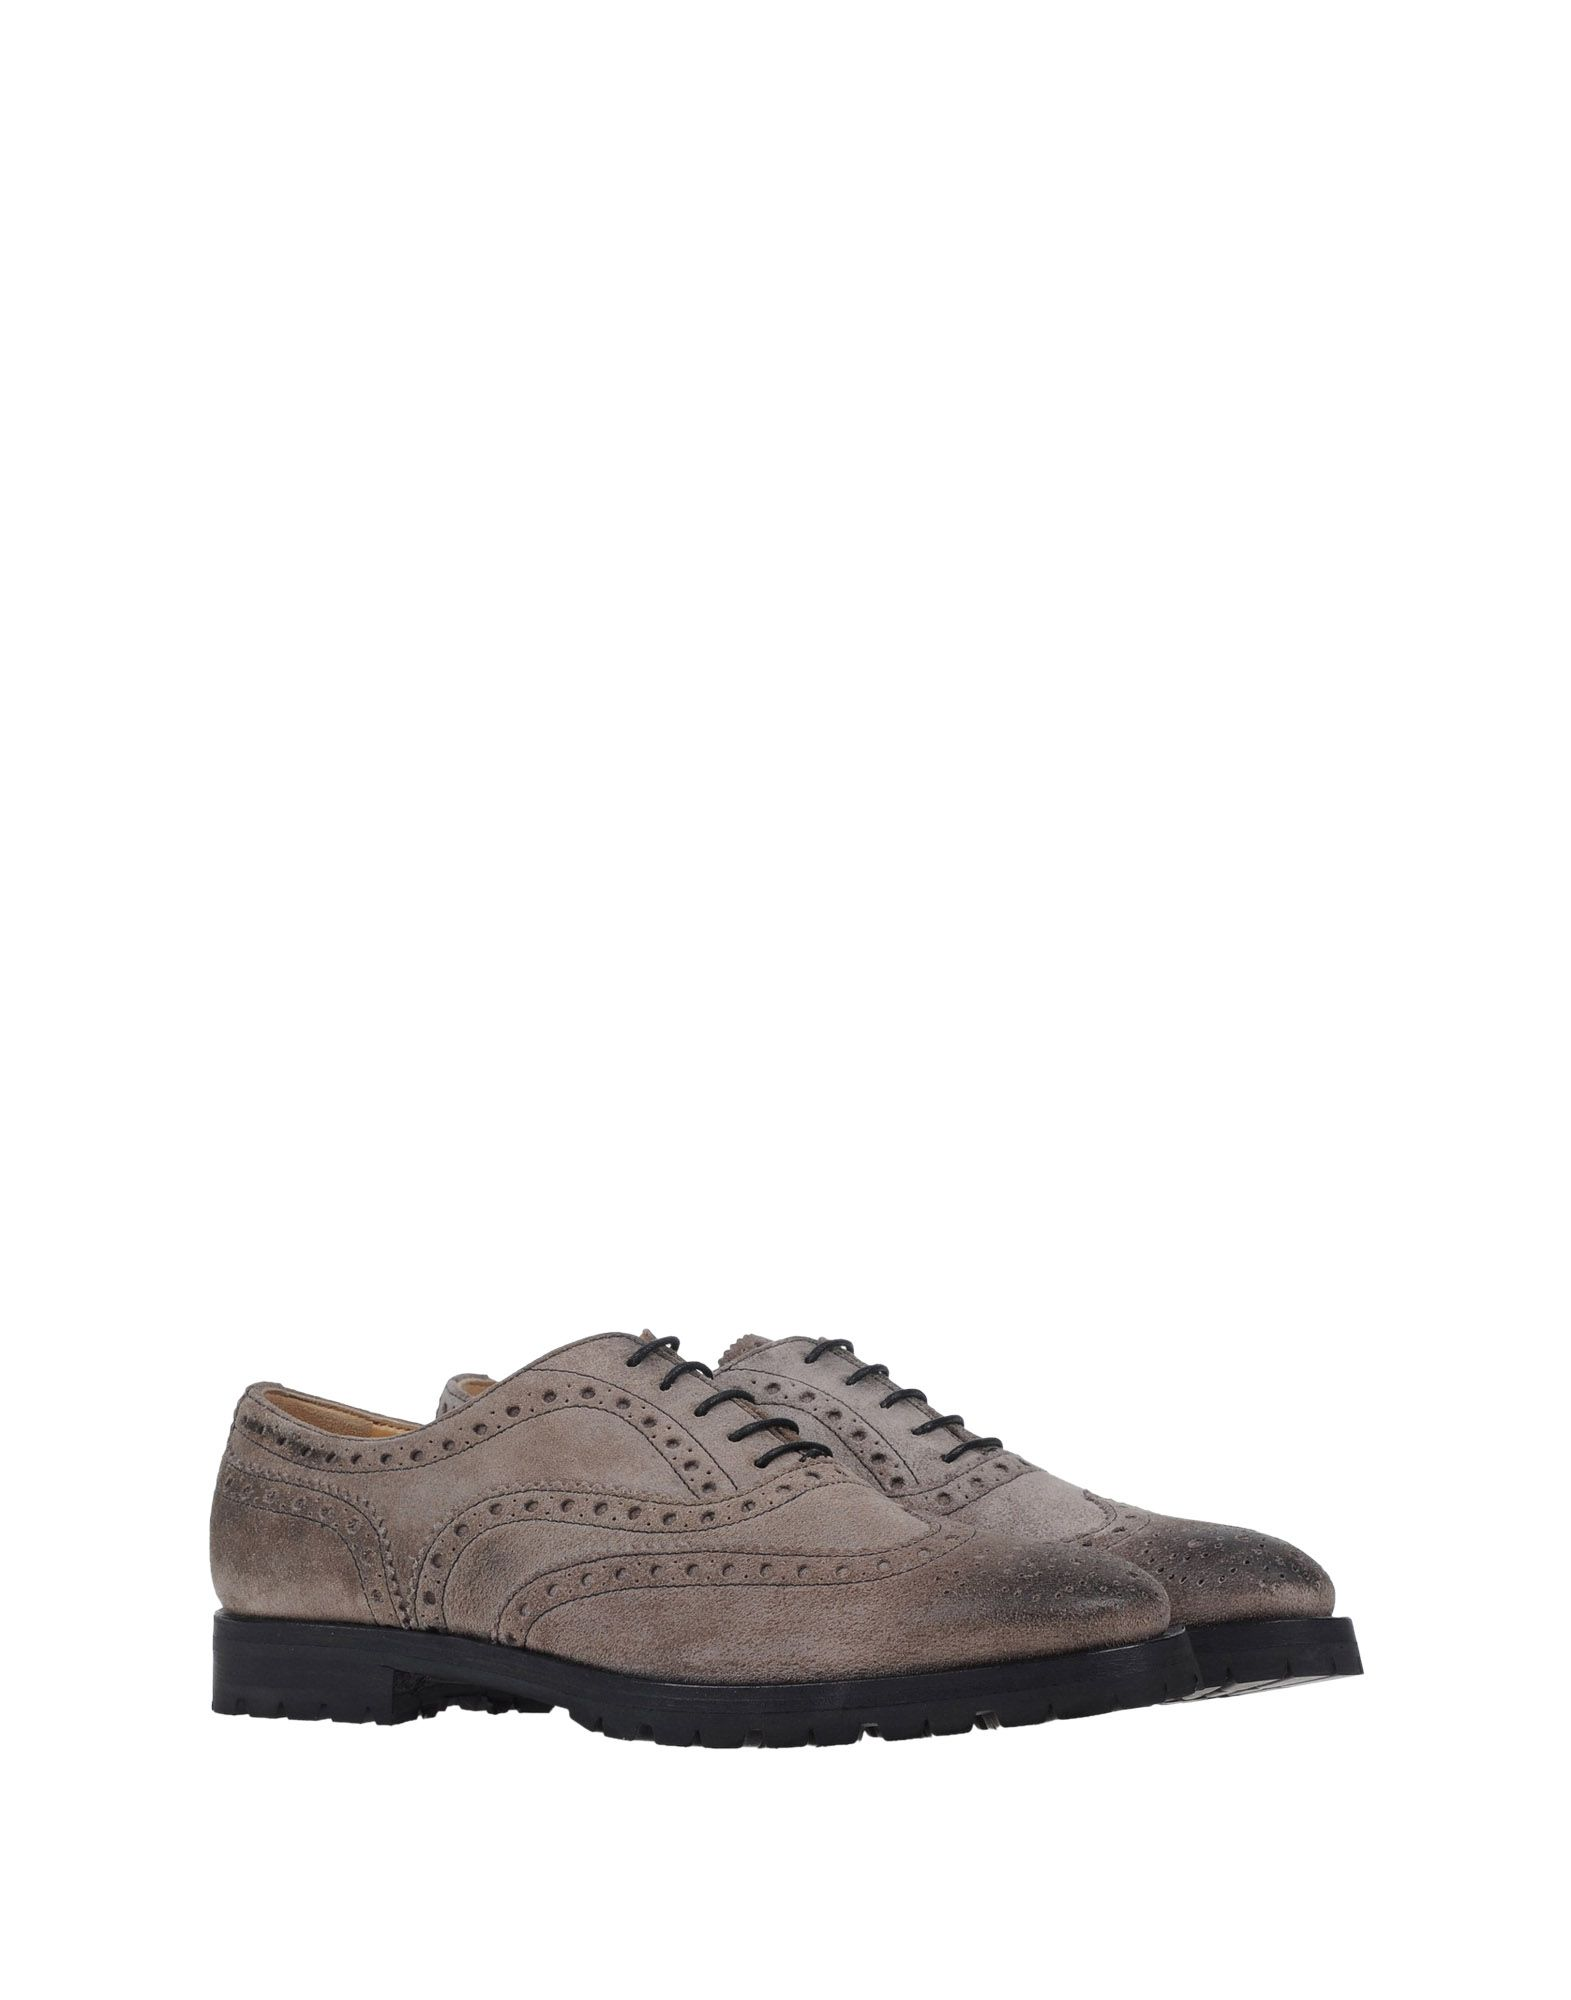 Church's Schnürschuhe Damen  11014287FRGut aussehende strapazierfähige Schuhe